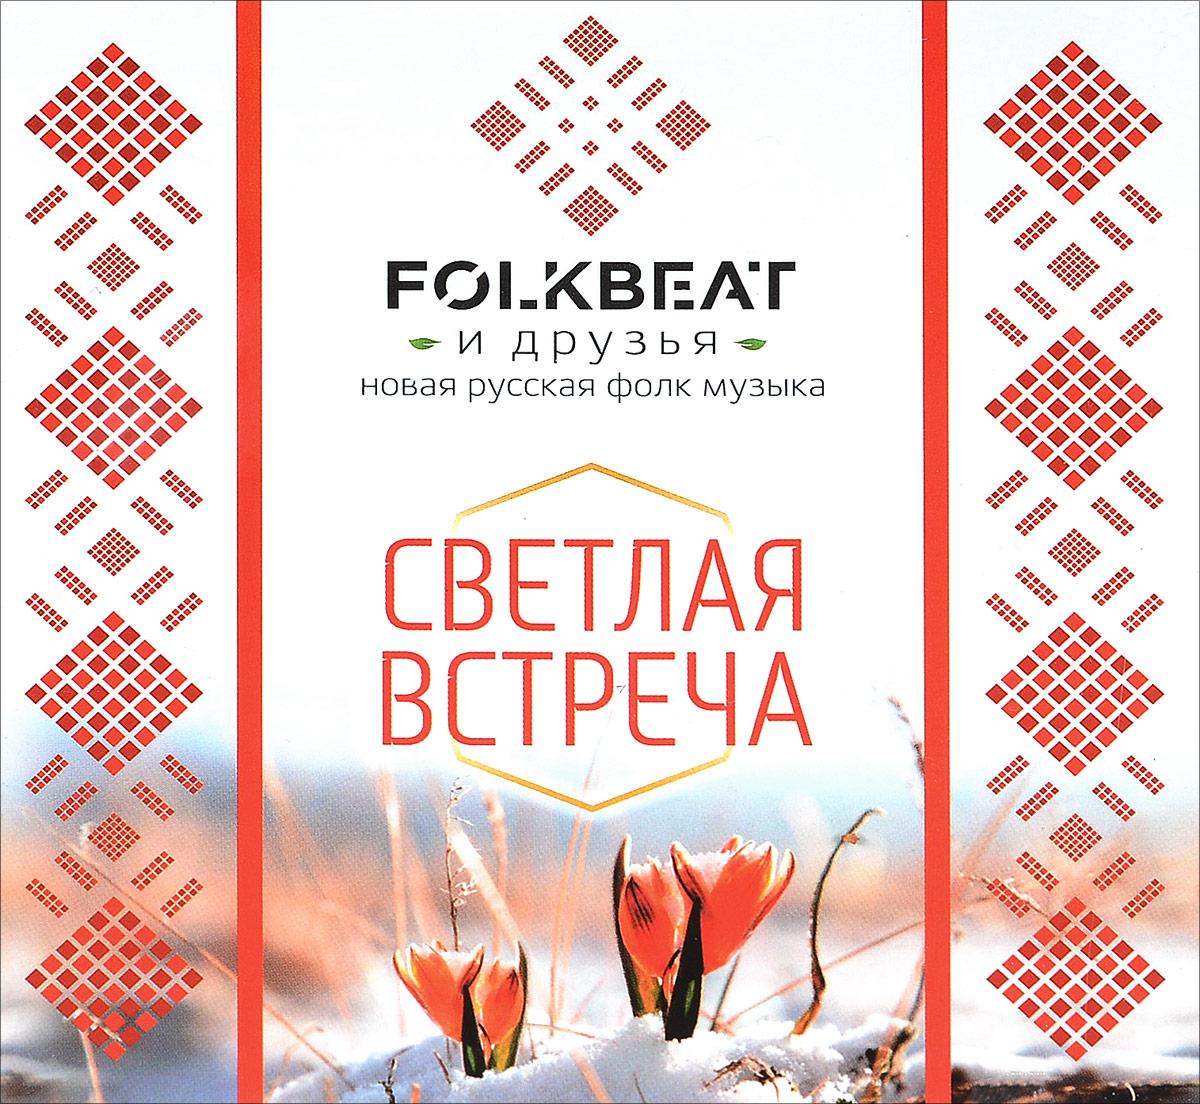 FolkBeat RF FolkBeat и друзья. Светлая встреча 86 wall panel transmitter rf remote control switch 1 button ac220v 10a